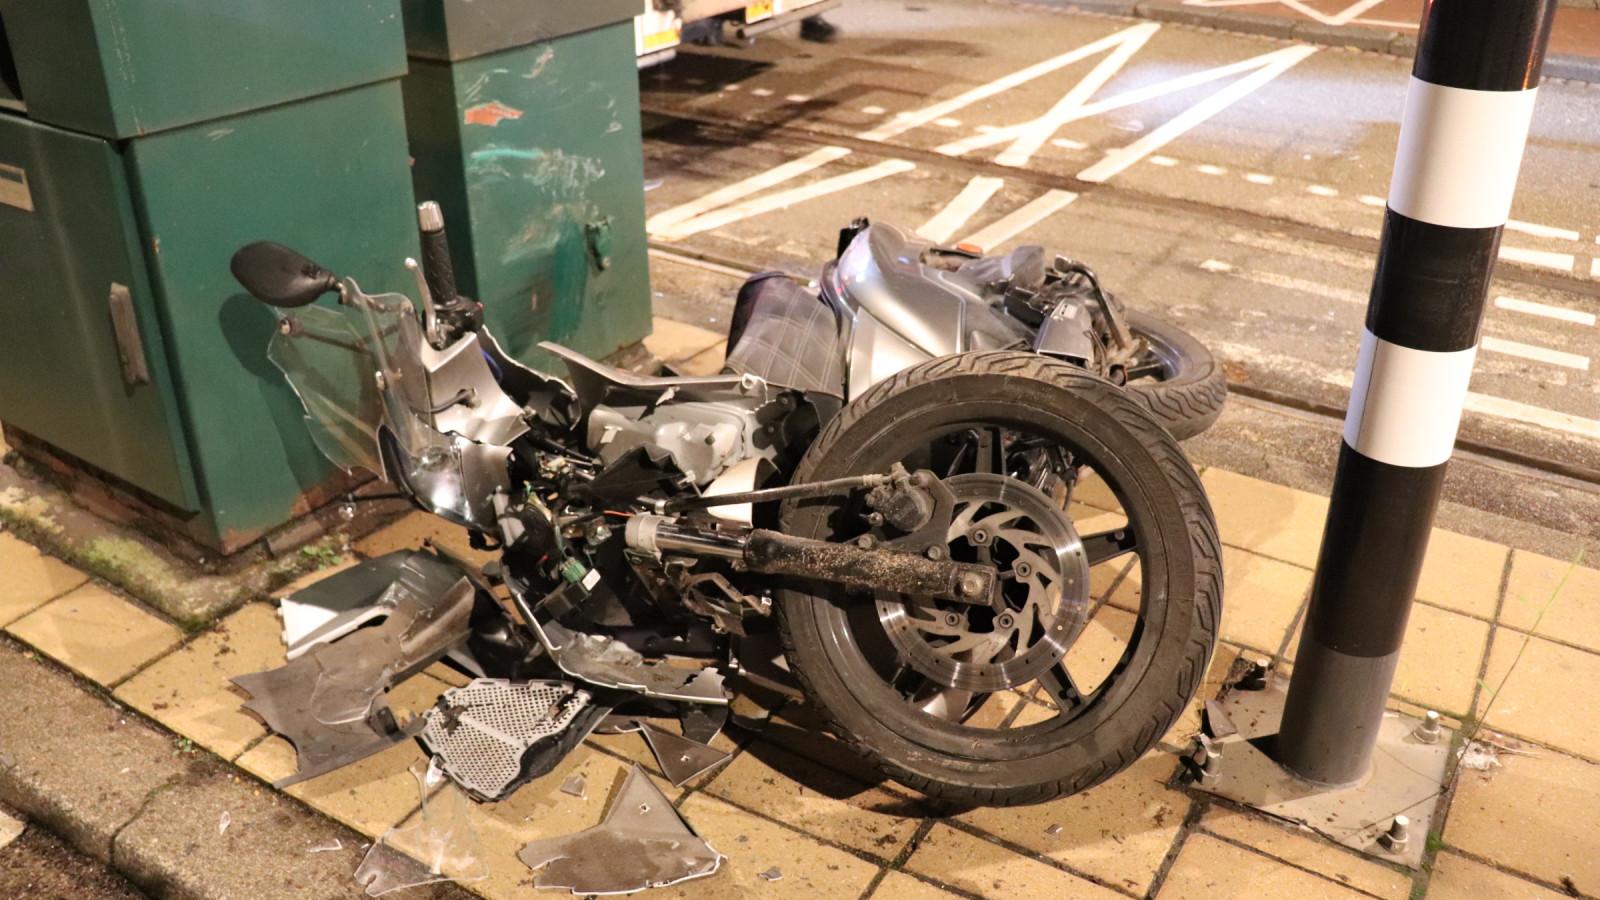 Scooterrijder gewond na botsing tegen slagboom in Oud-West.